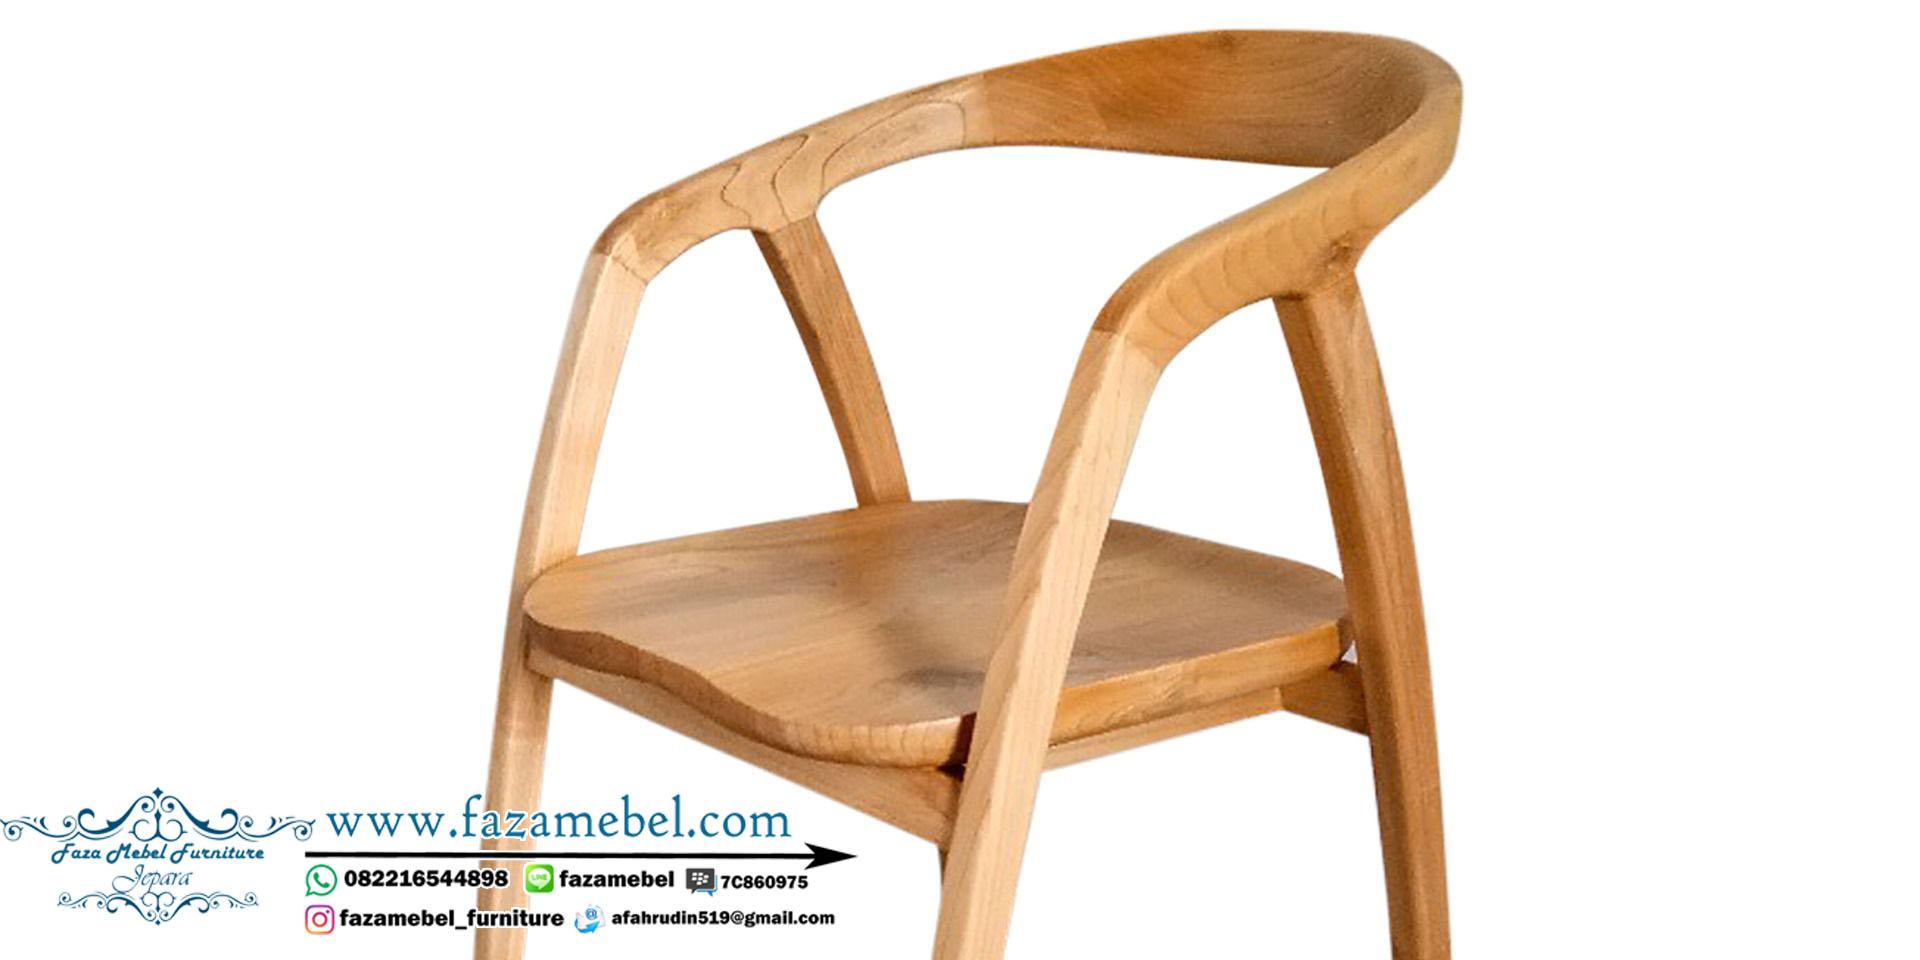 kursi-makan-kayu-minimalis-terbaru-1